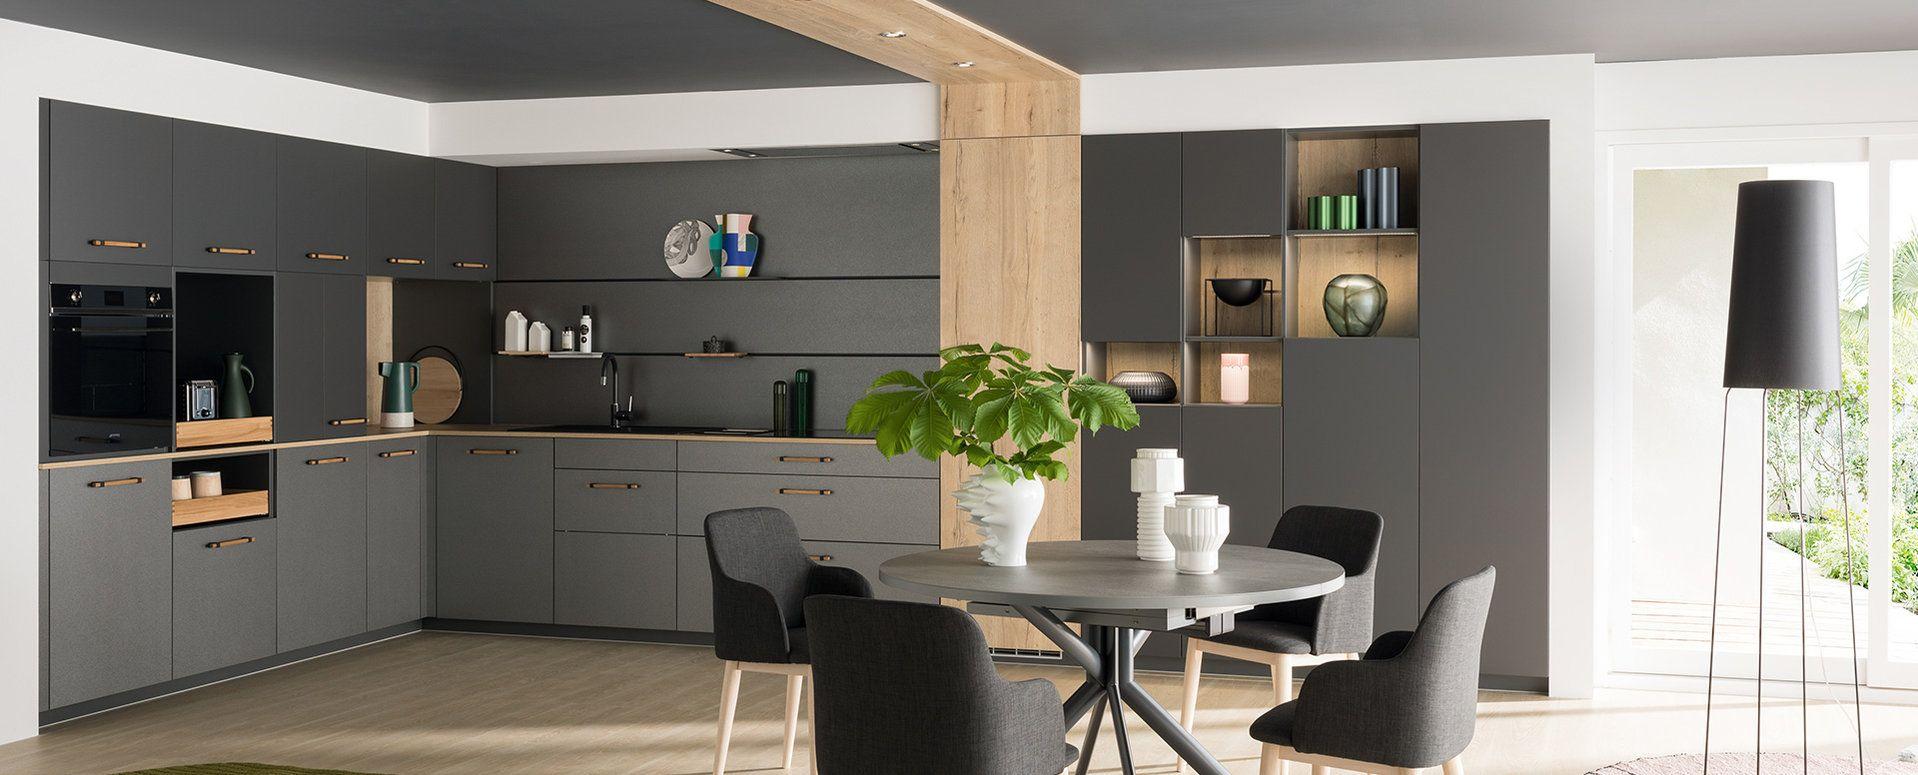 Ambiance Mediane Cuisine Moderne Cuisine Appartement Et Meuble